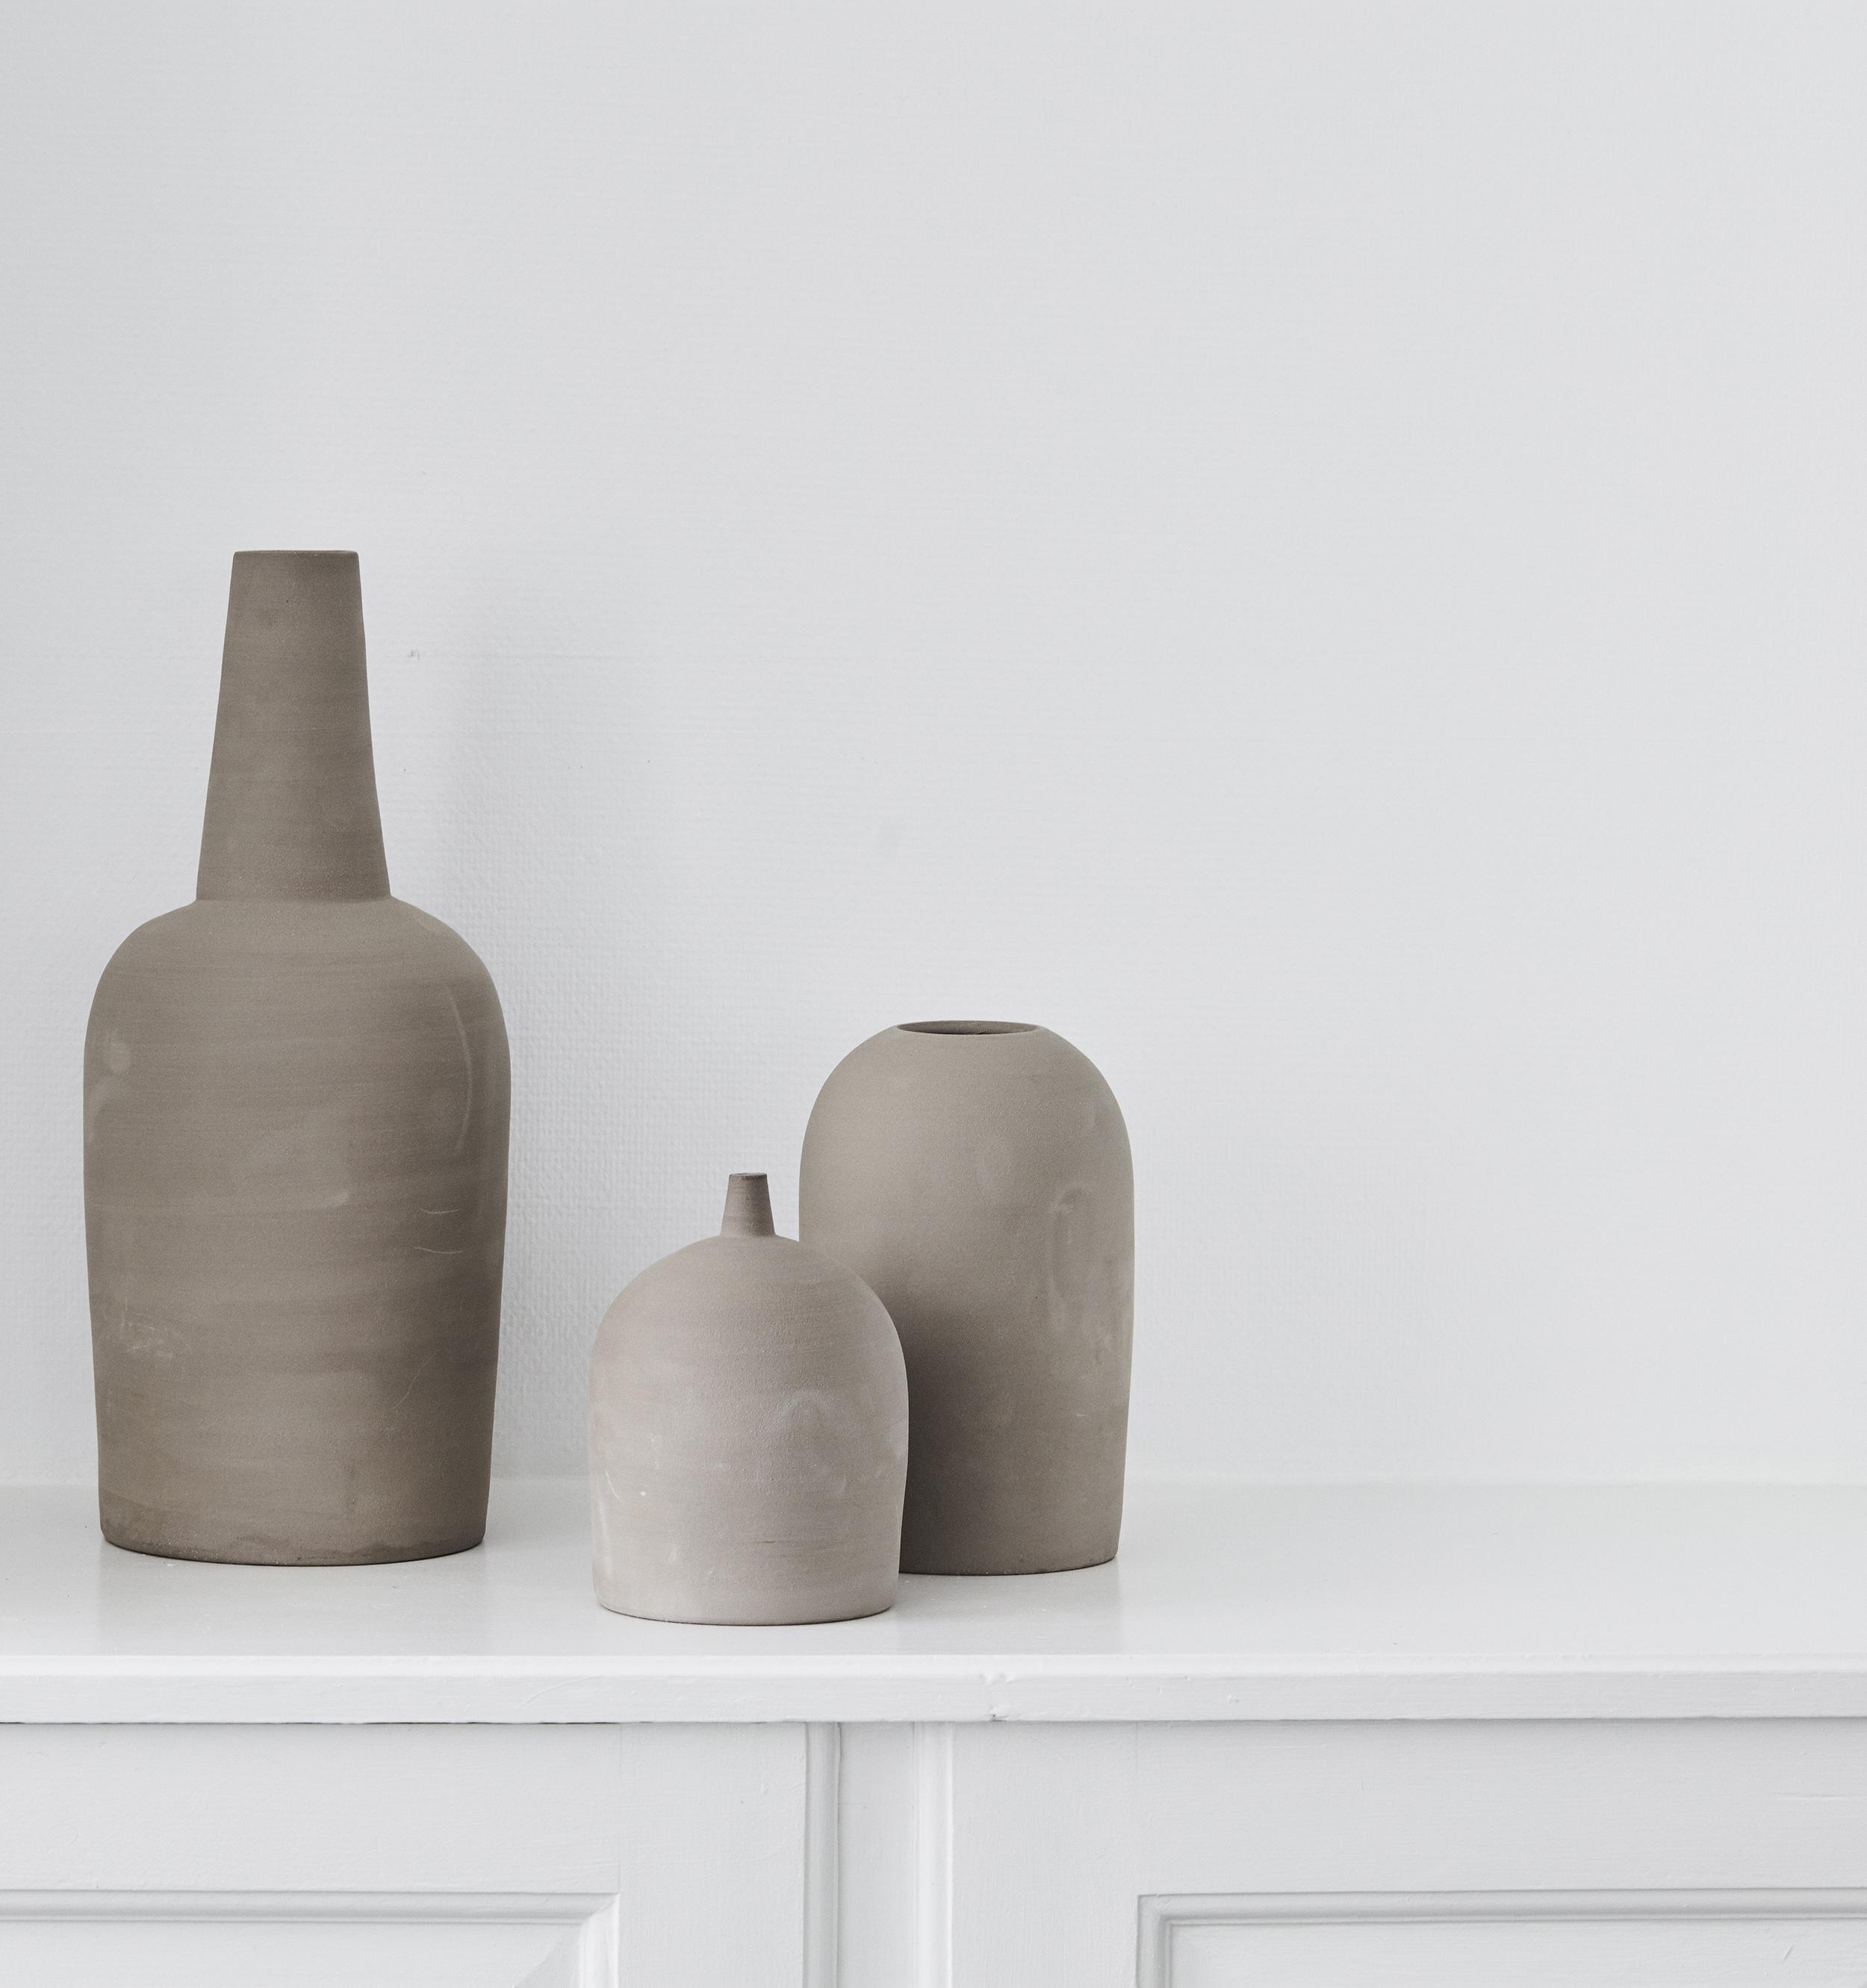 Kristina Dam Dome Vases